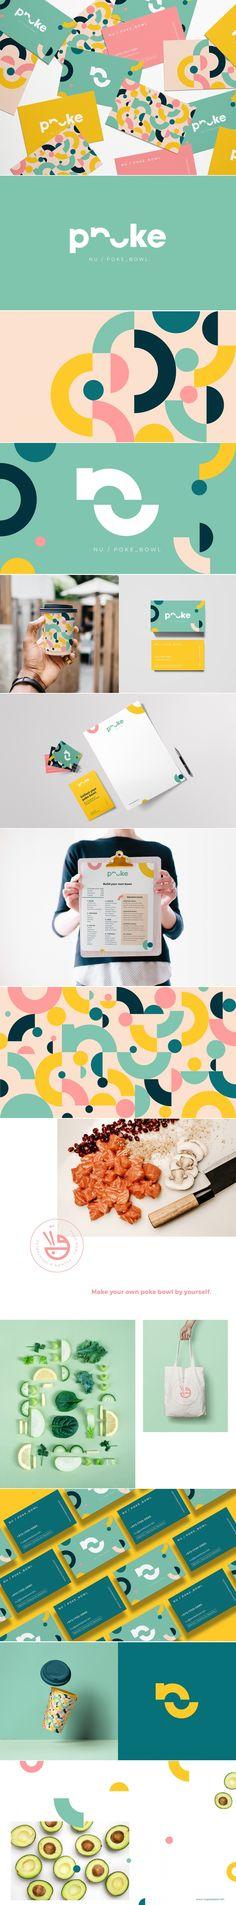 Nu Poke Bowl healthy food brand identity design by Rita Duczmańska-Drabina – ThePins Brand Identity Design, Graphic Design Branding, Corporate Design, Logo Design, Branding Agency, Kids Branding, Logo Branding, Logos, Typography Logo